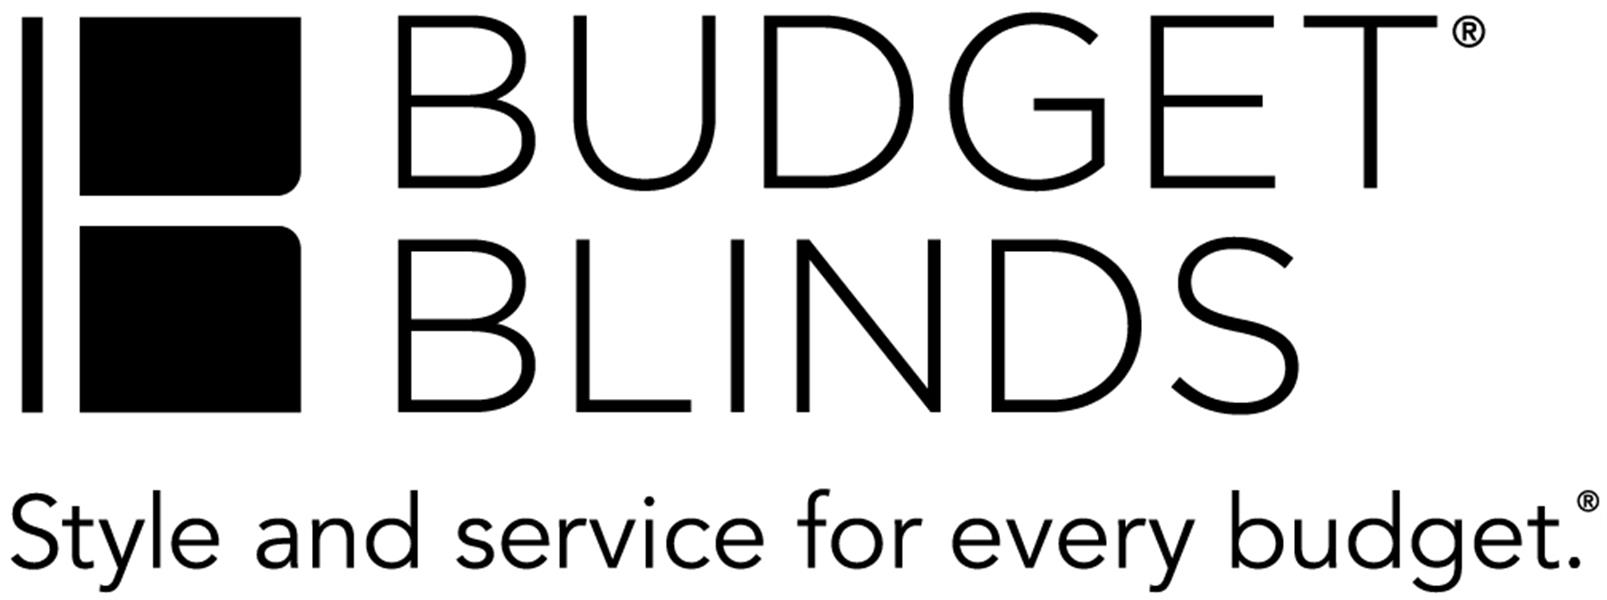 Budget Blinds Serving Wheaton, Lombard & Schaumburg